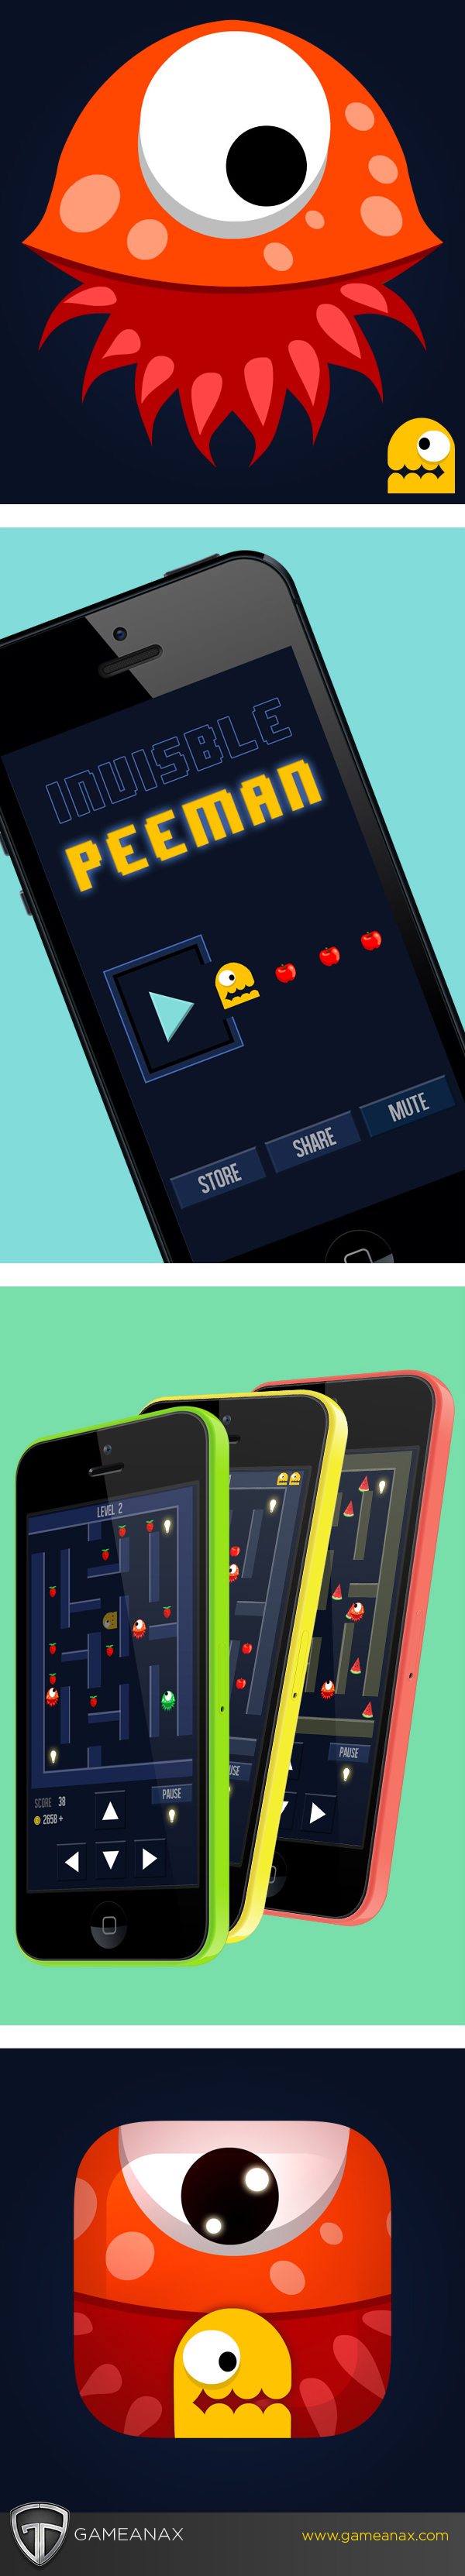 UI ux iphone iPad Pacman mobile gaming Gaming Games